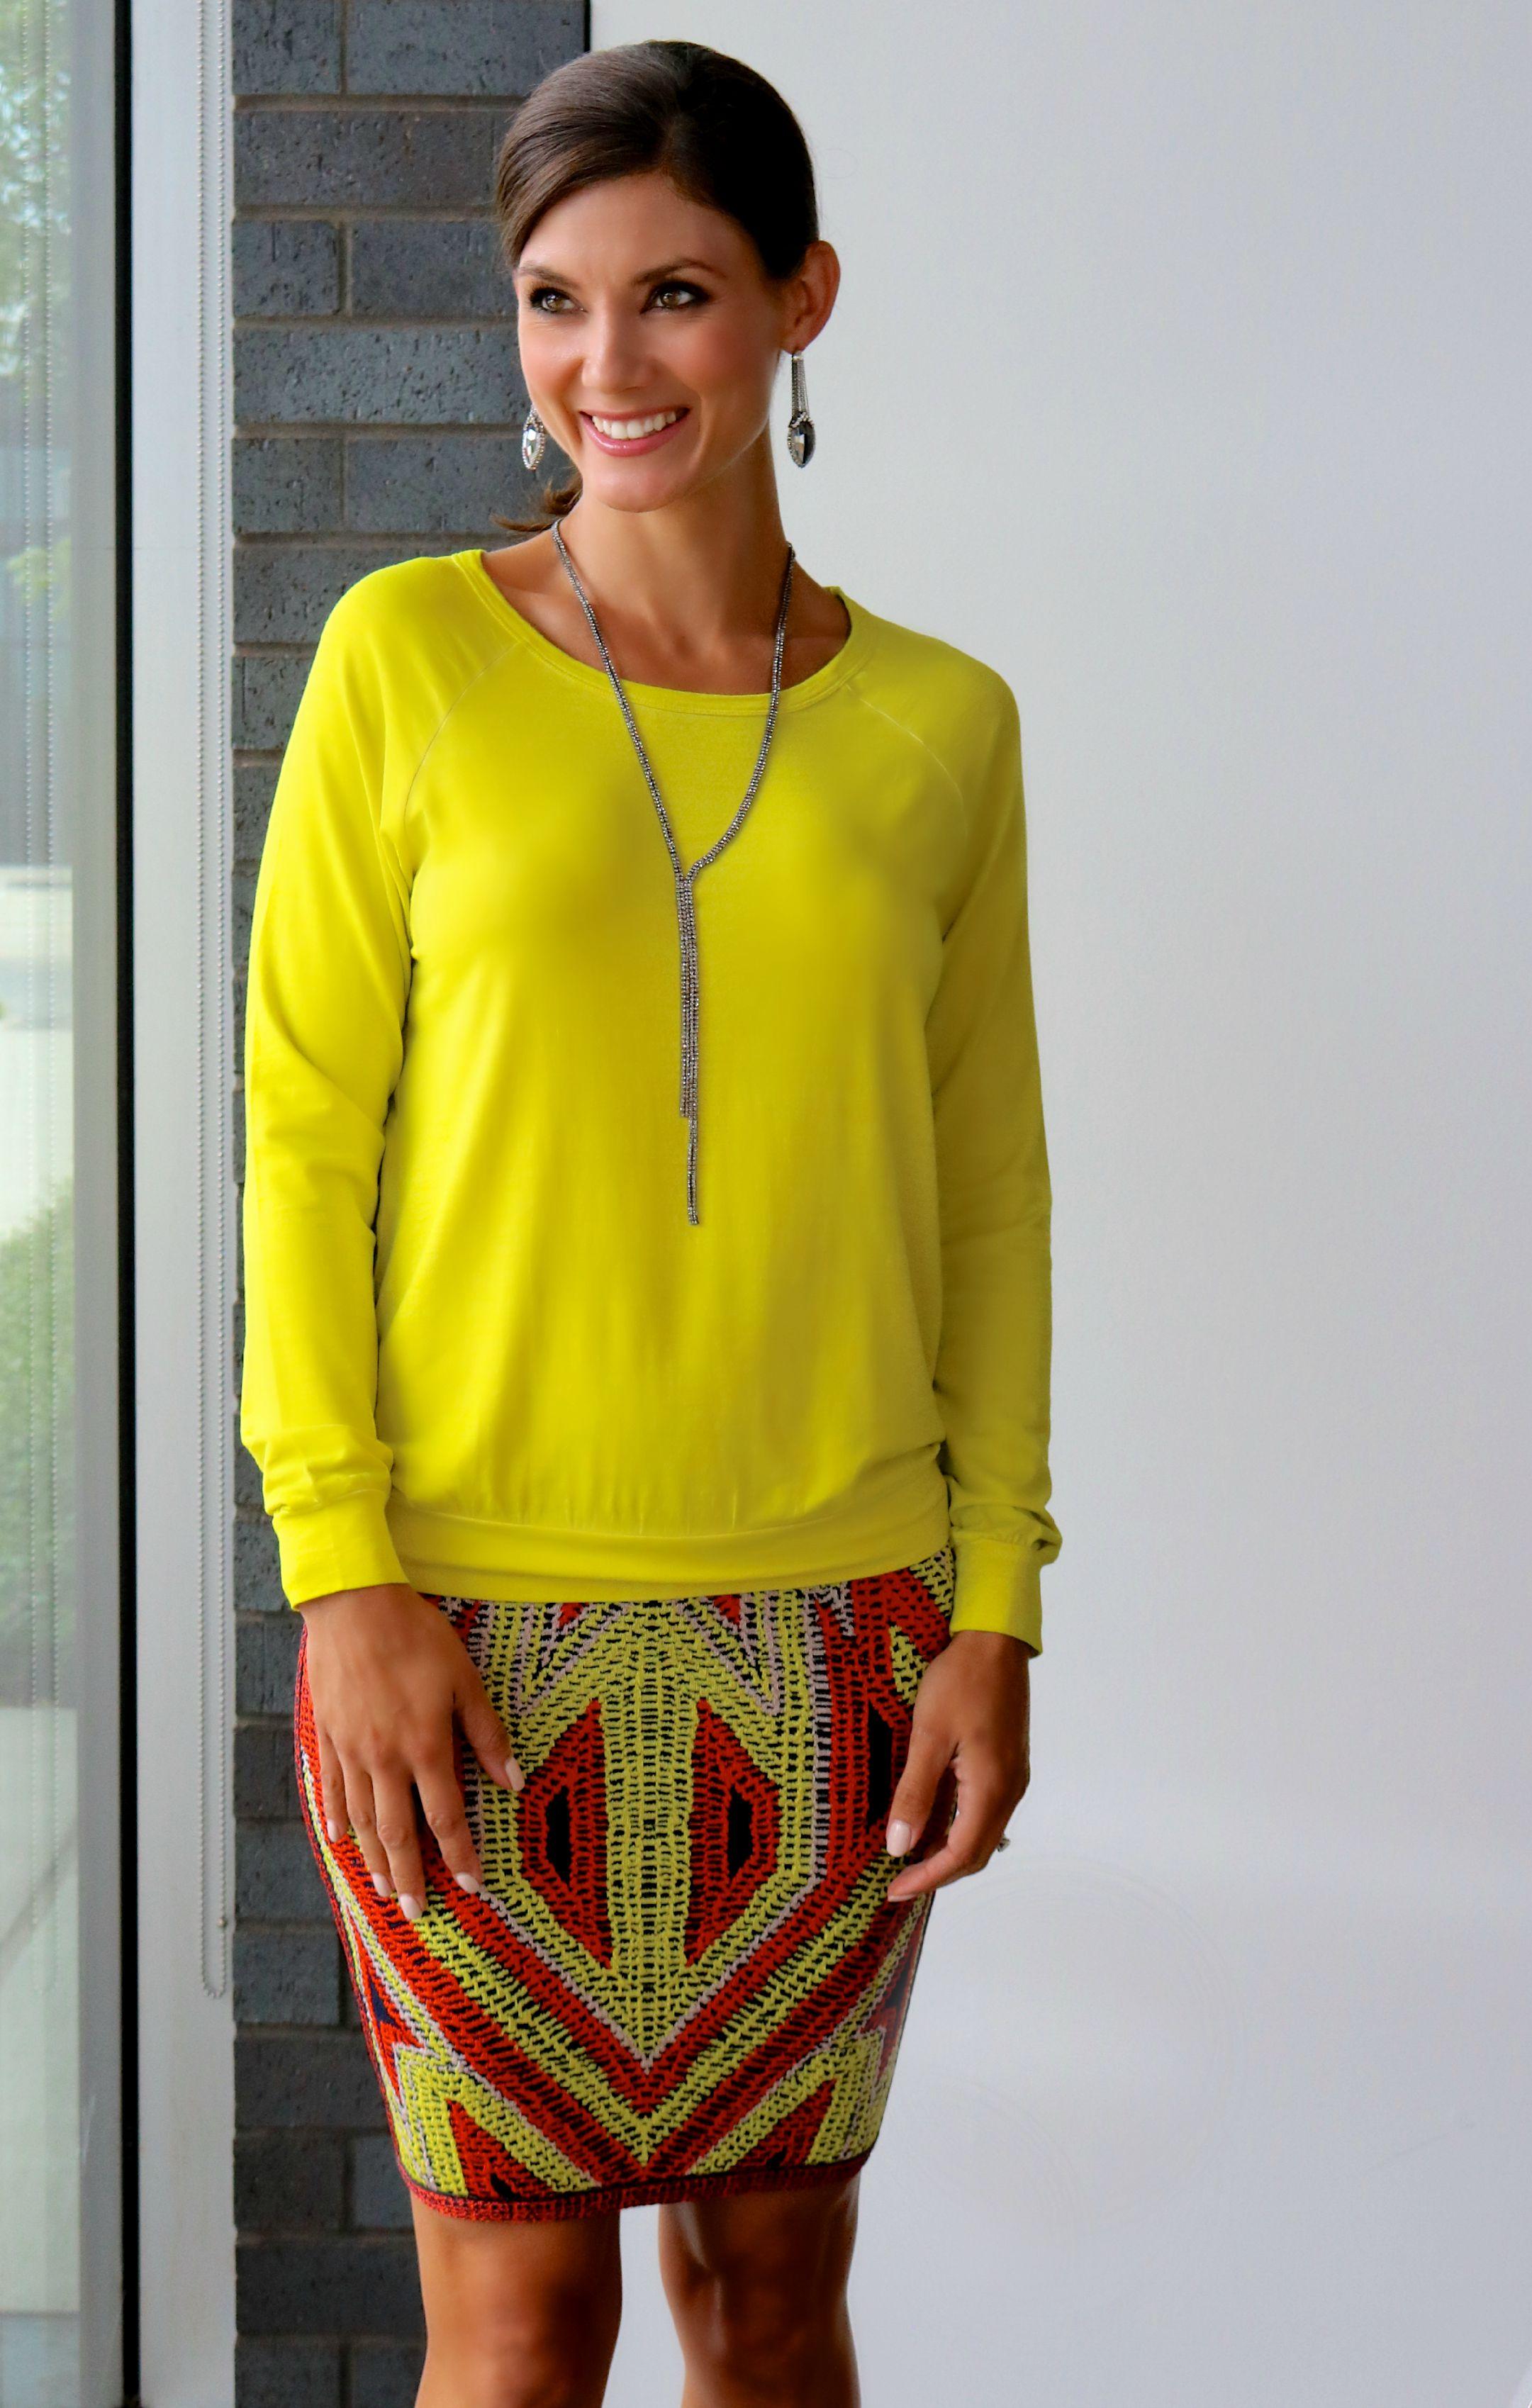 Majestic Filatures Hand Dyed Silk Raglan , Herve Leger Ola Jacquard Skirt ,  Chain Drop Earrings